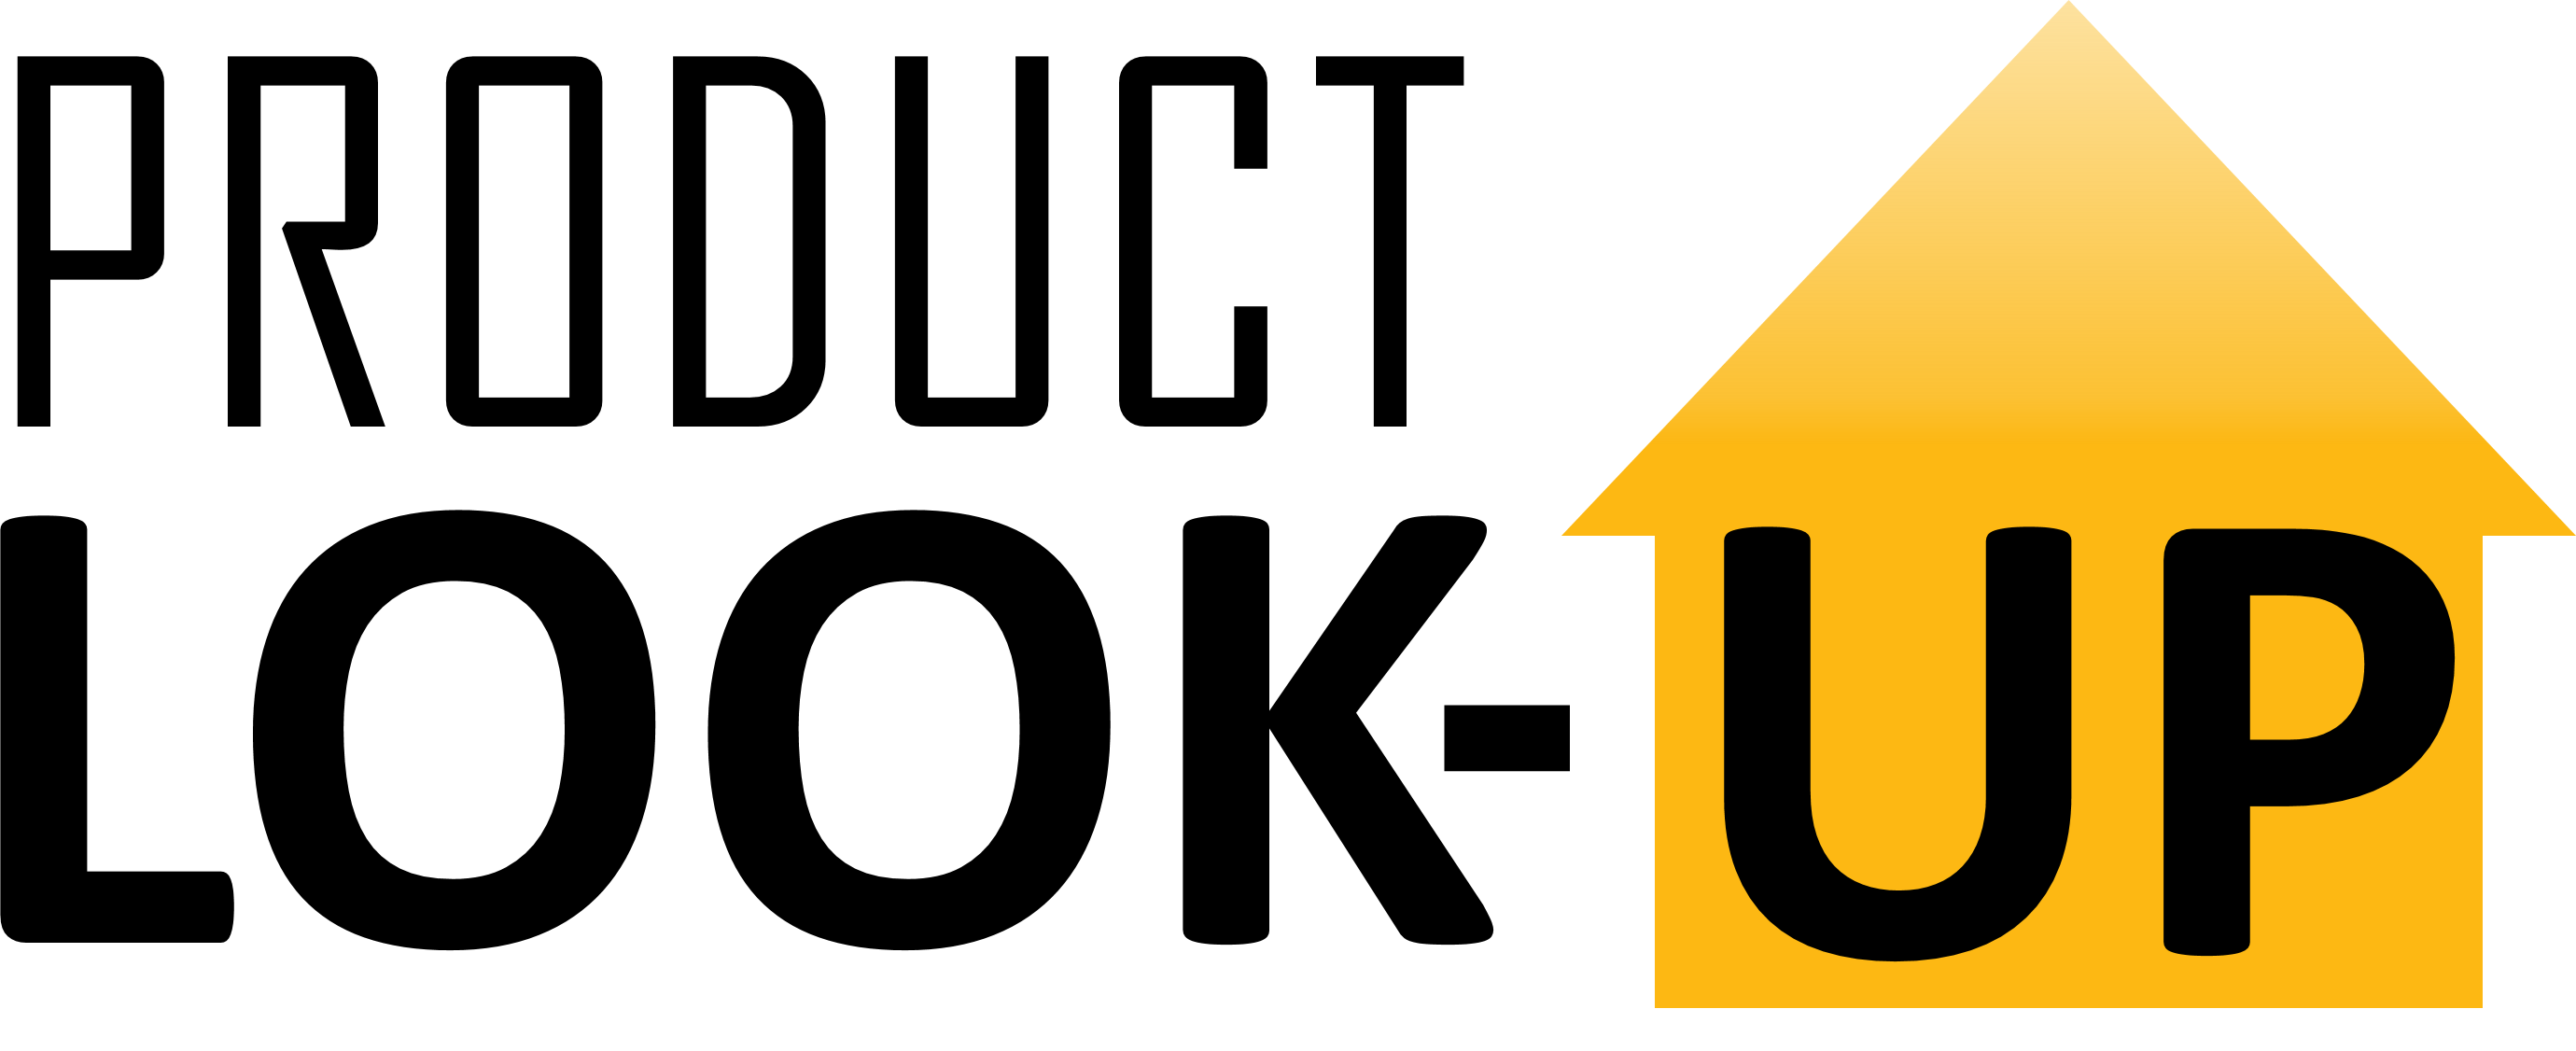 Jigsaw company lookup - Customer Care Online Service Center Houghton Mifflin Harcourt Company